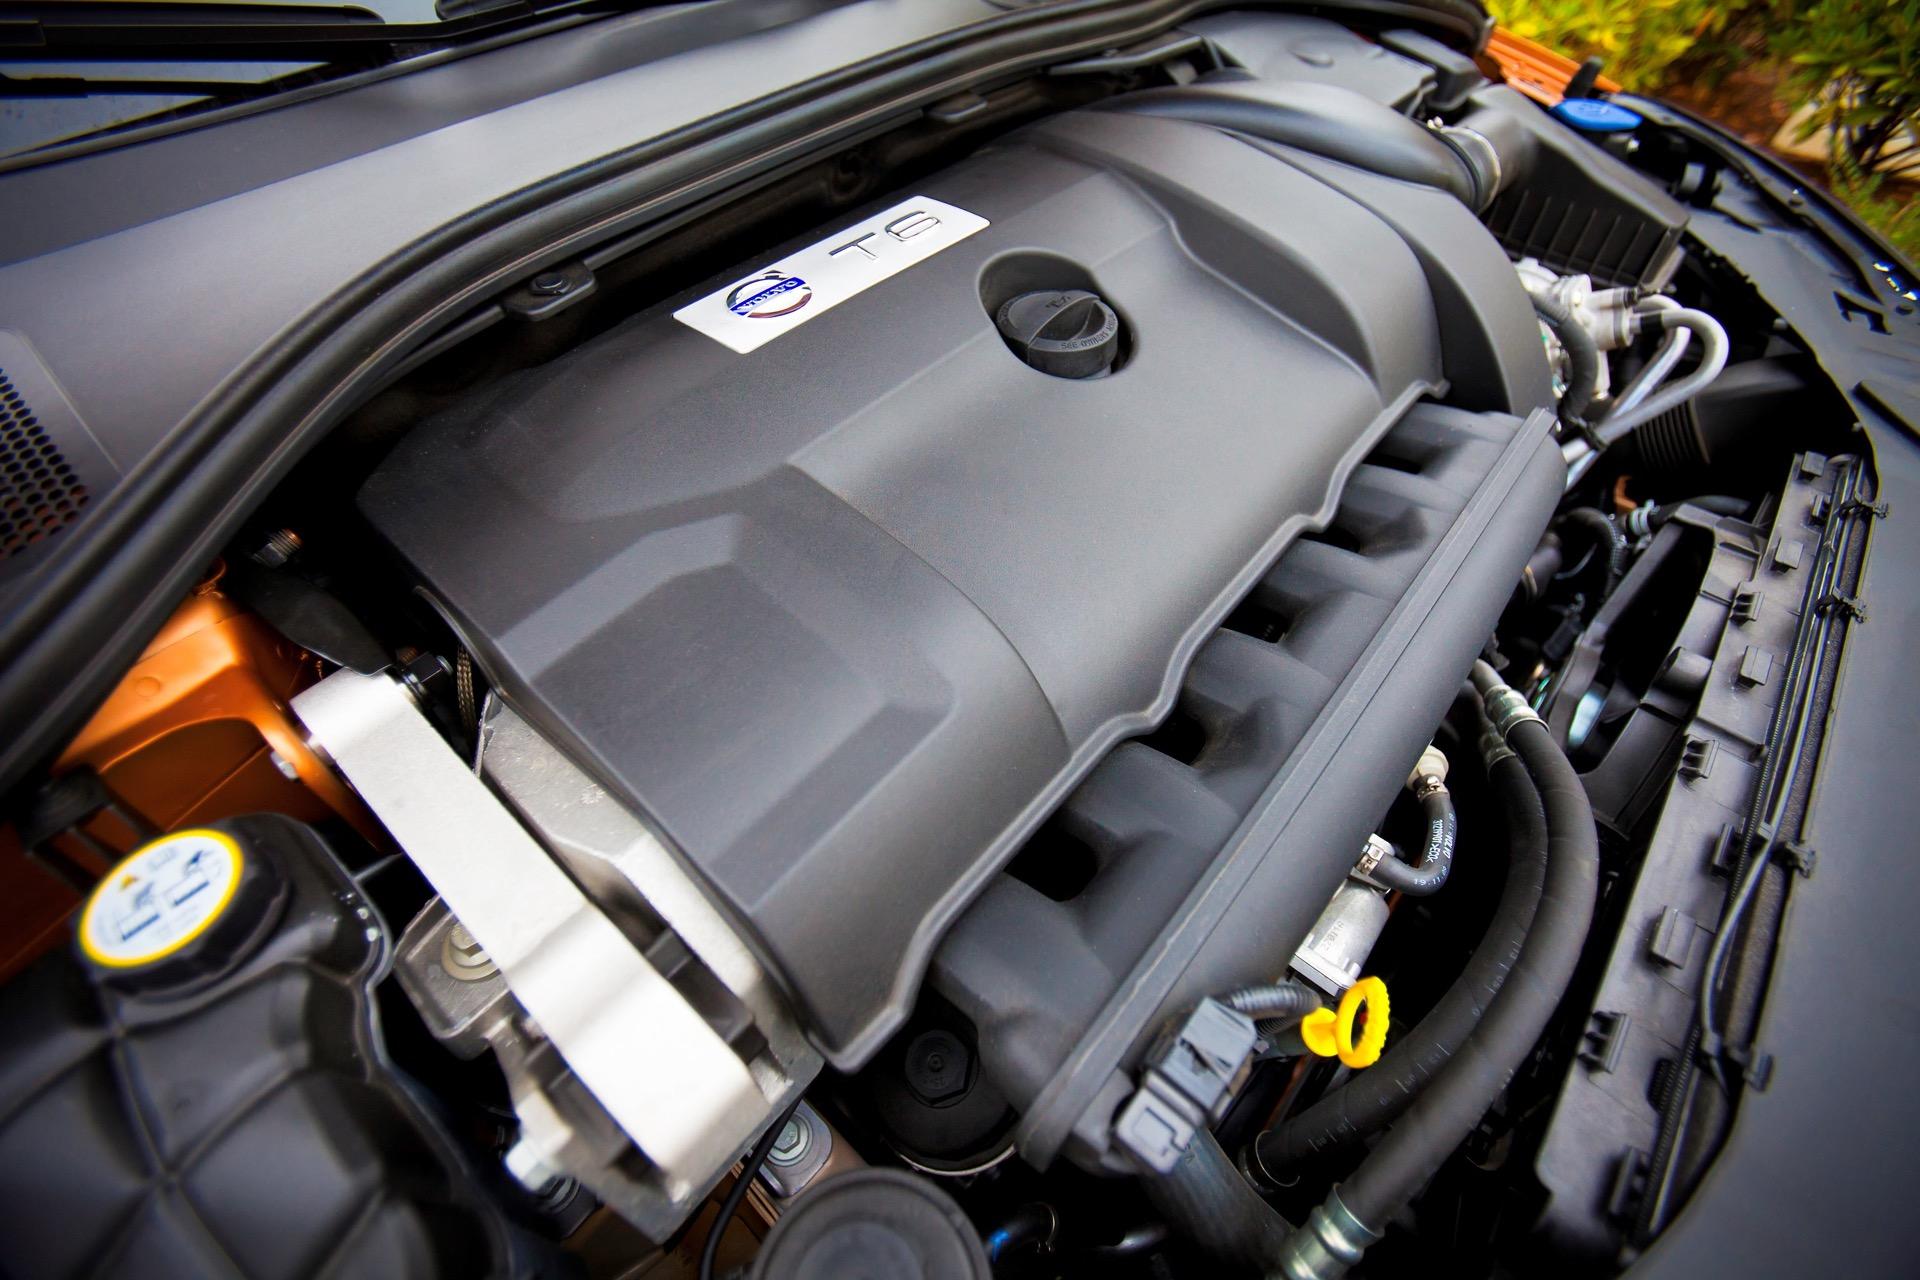 S60 T6 Awd Engine01 -  Volvo